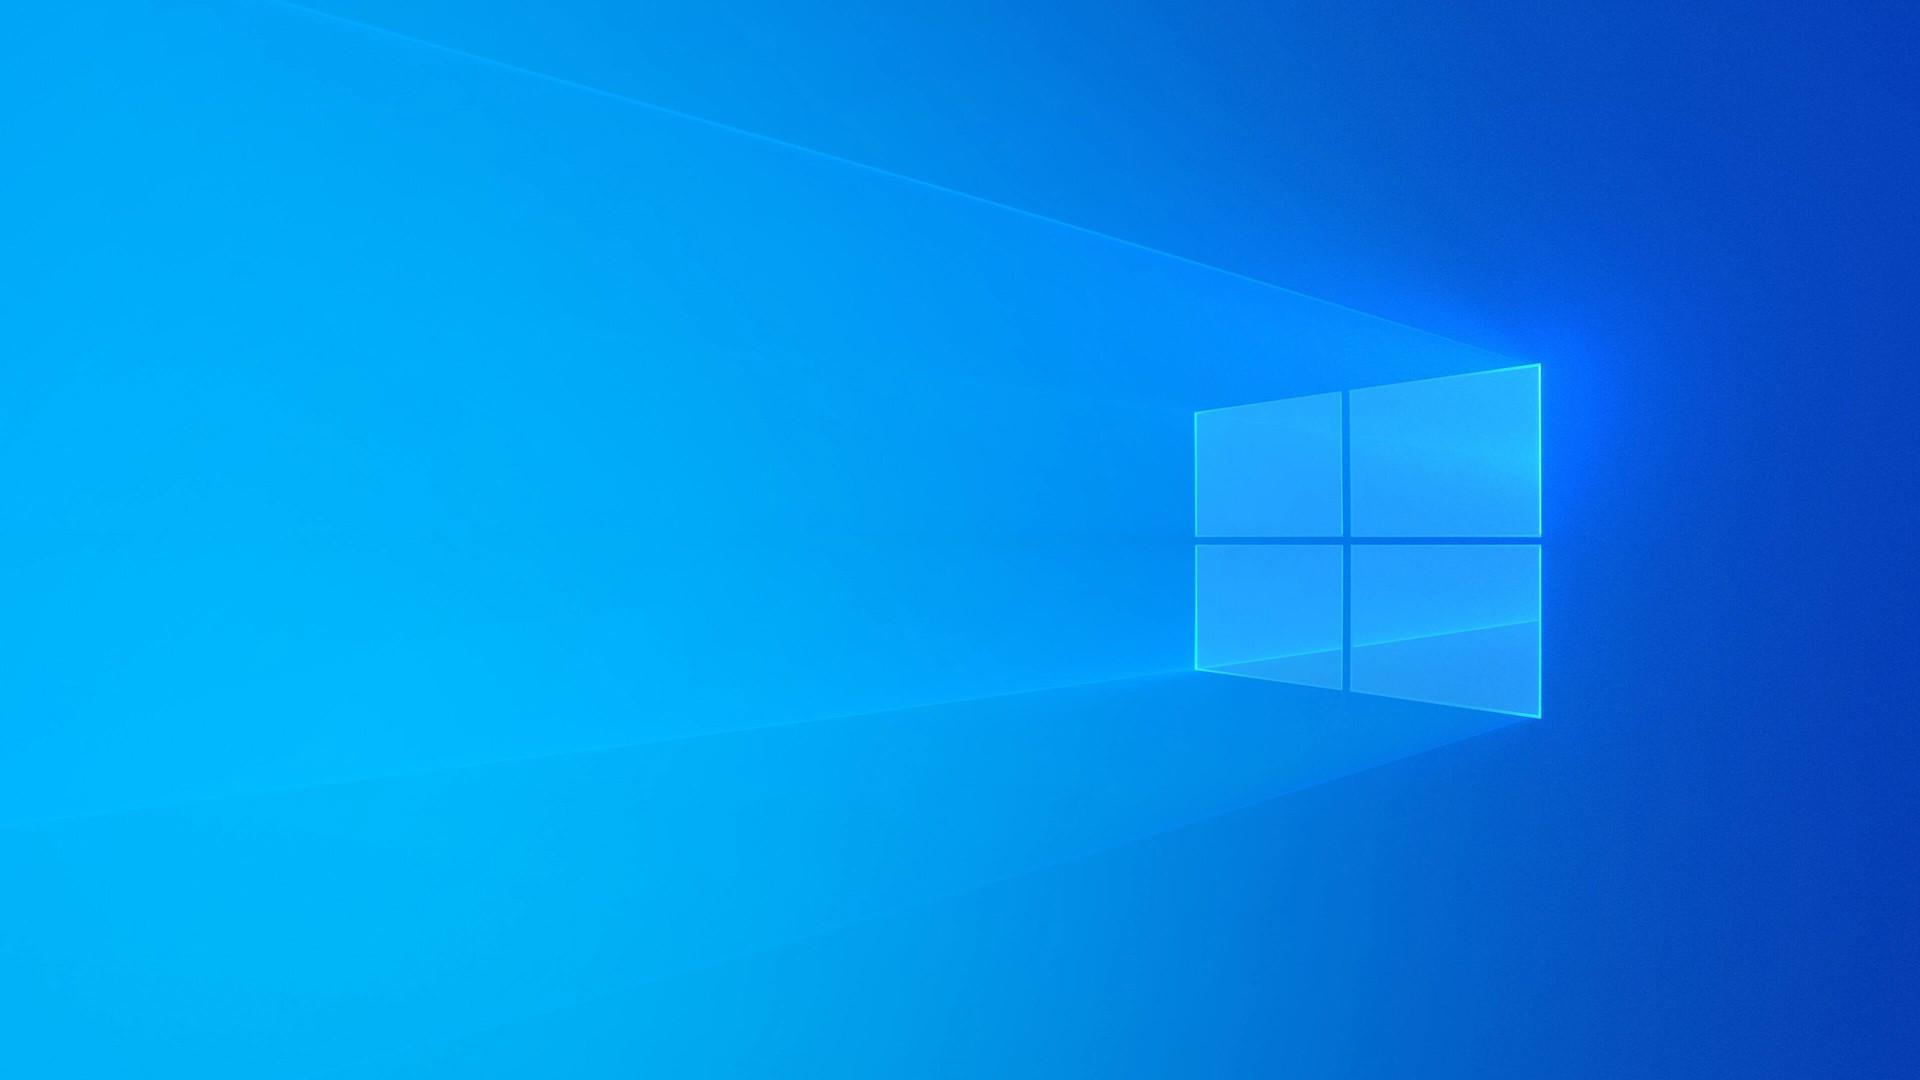 Windows 10 has achieved 1 Billion Monthly Active Users Worldwide.